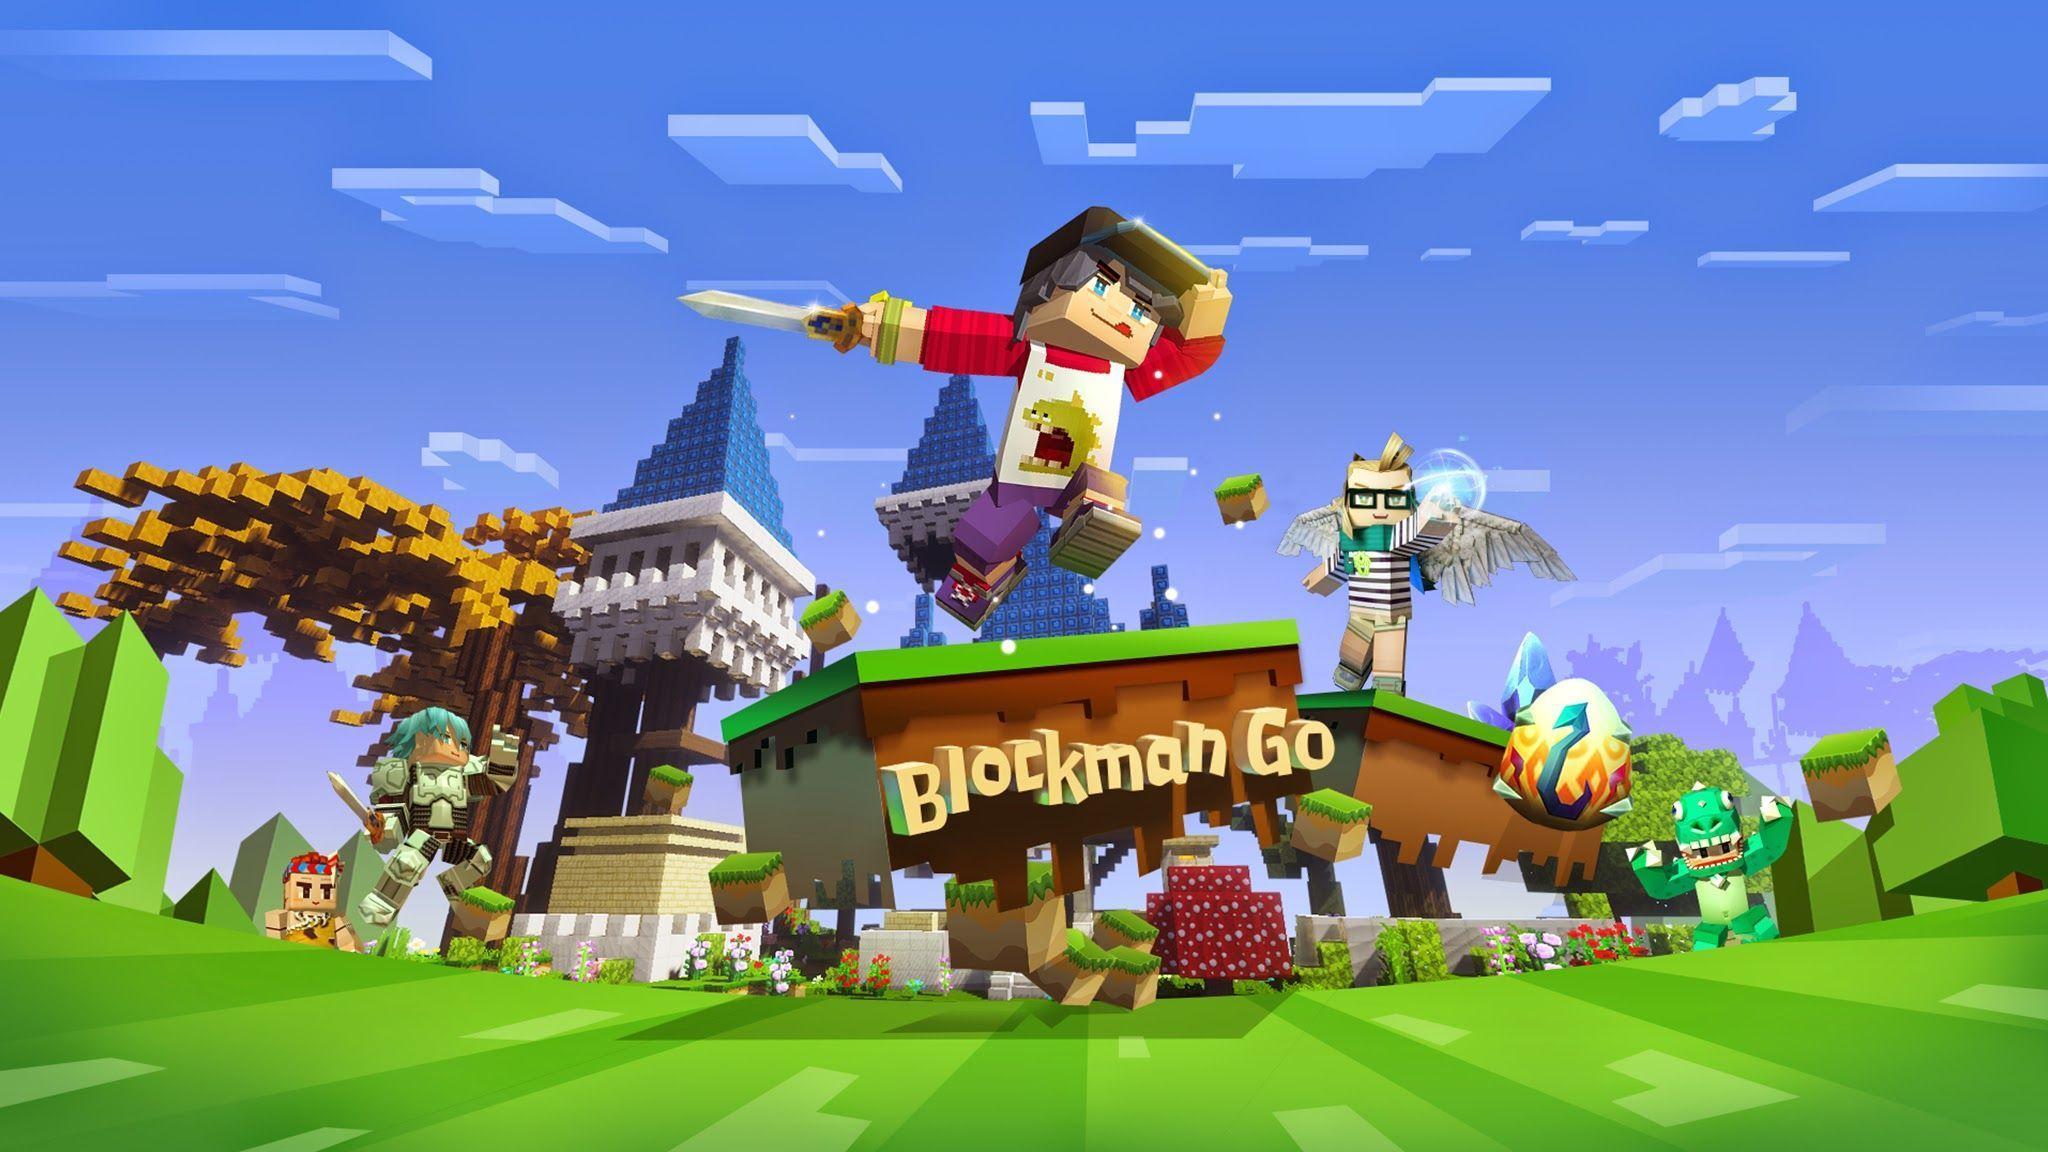 Blockman Go Wallpapers Top Free Blockman Go Backgrounds Wallpaperaccess